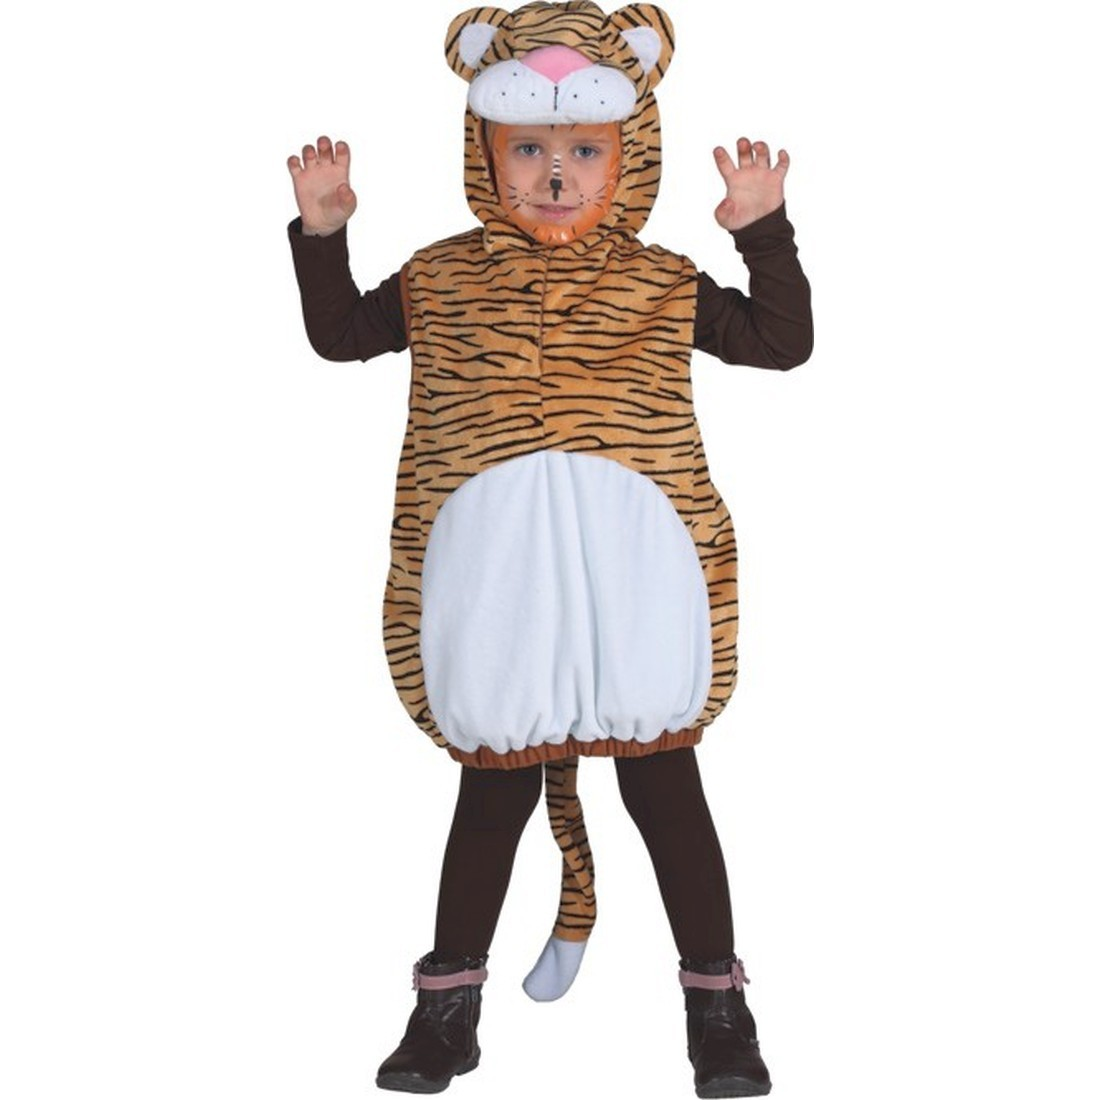 tigerkost m kost m kleinkind tiger 104 3 4 jahre 22 95. Black Bedroom Furniture Sets. Home Design Ideas